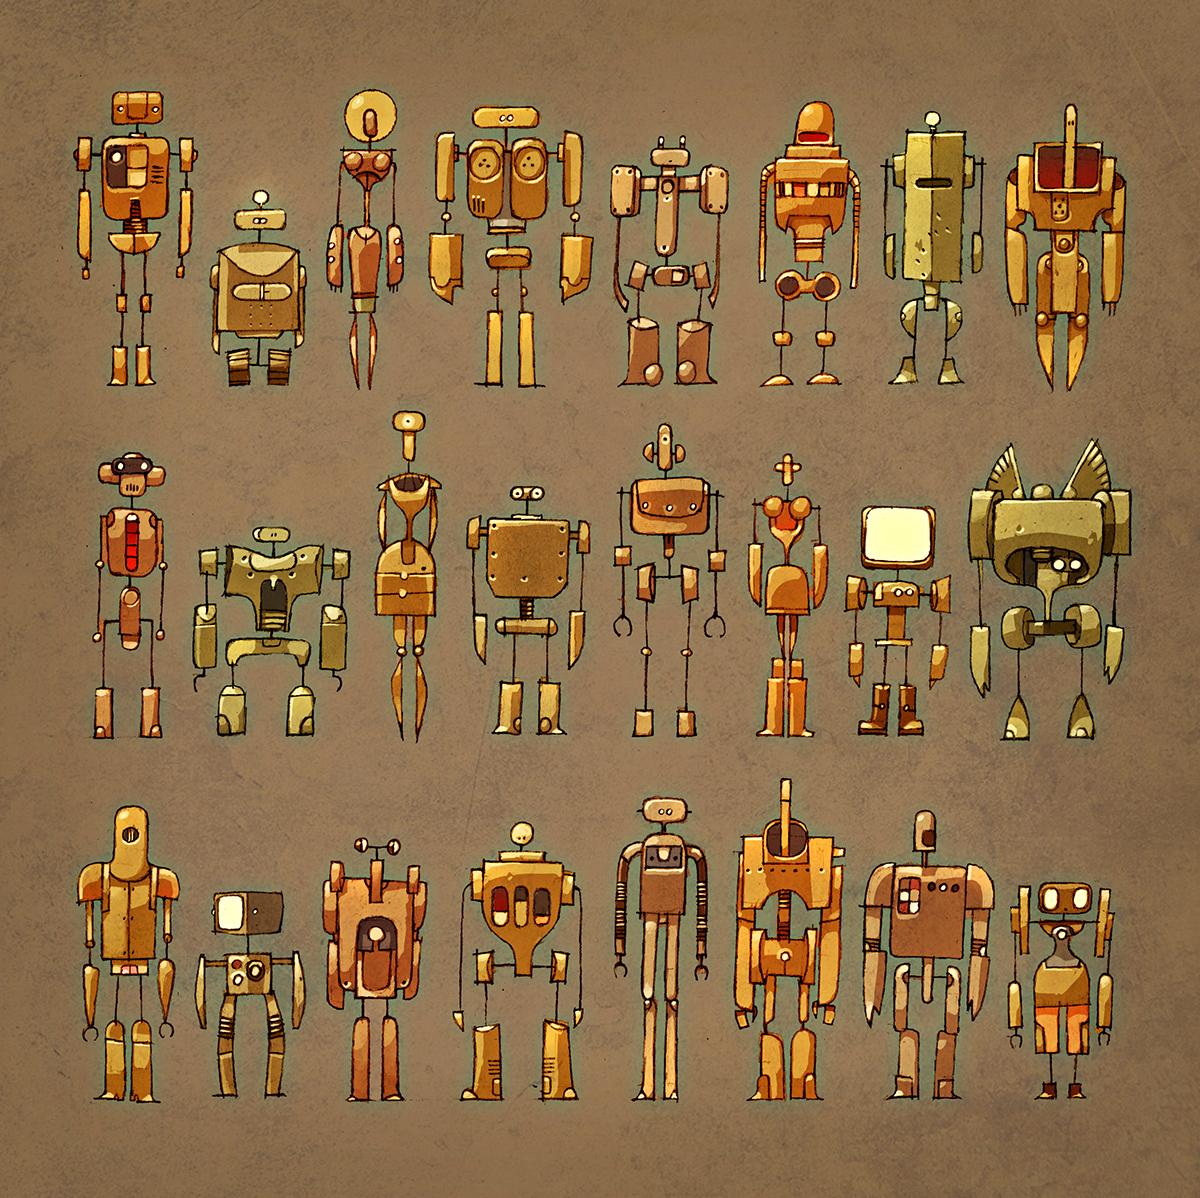 24robotsS